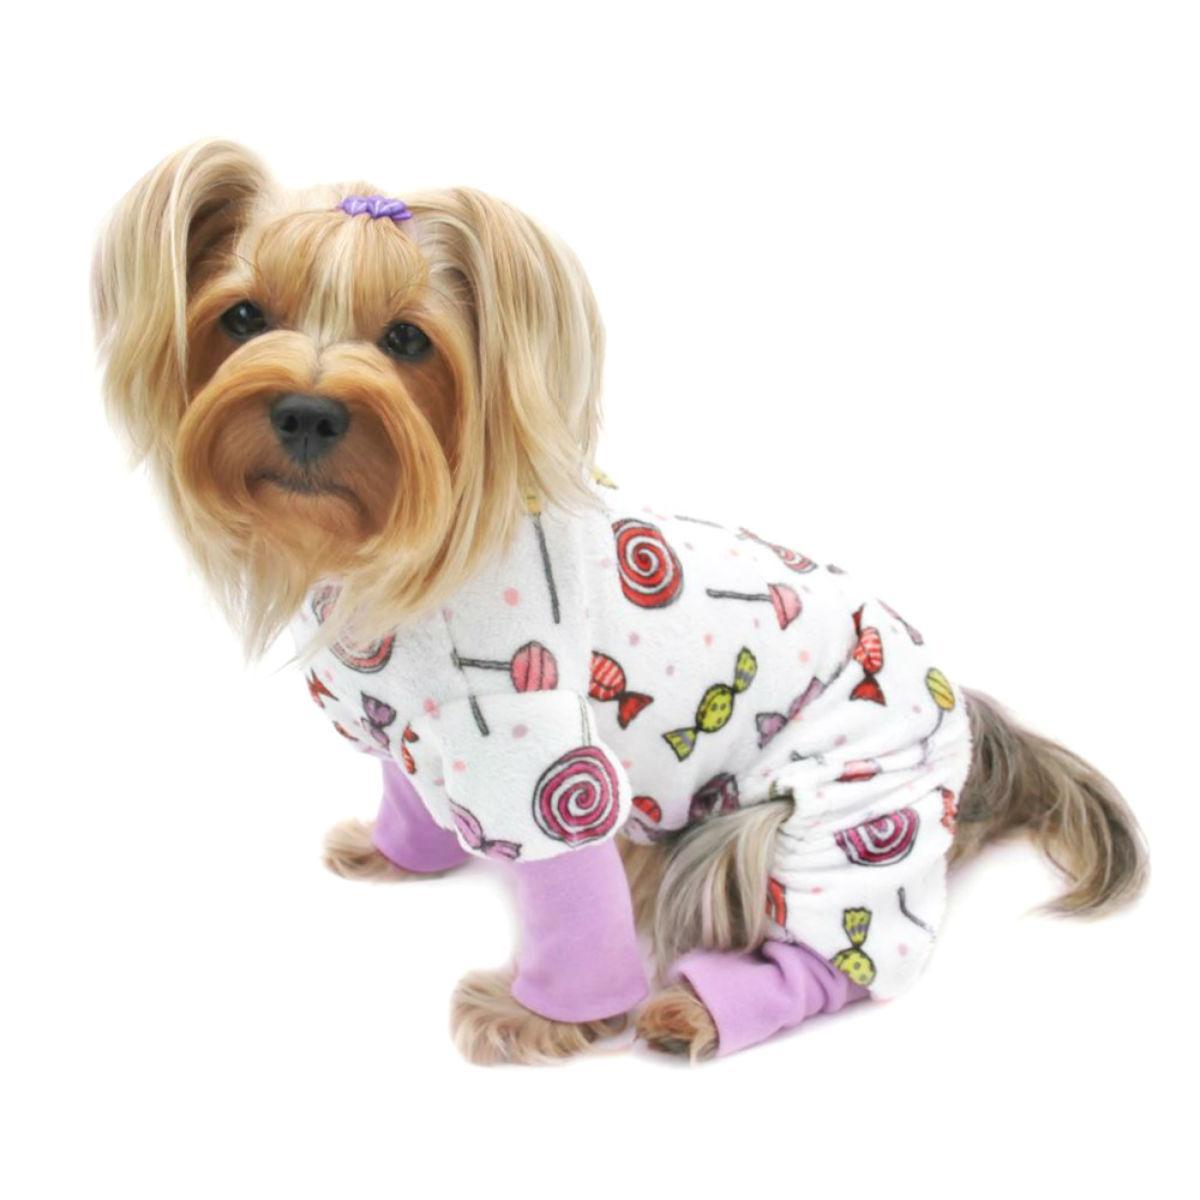 Sweet Candies Ultra Soft Dog Pajamas by Klippo